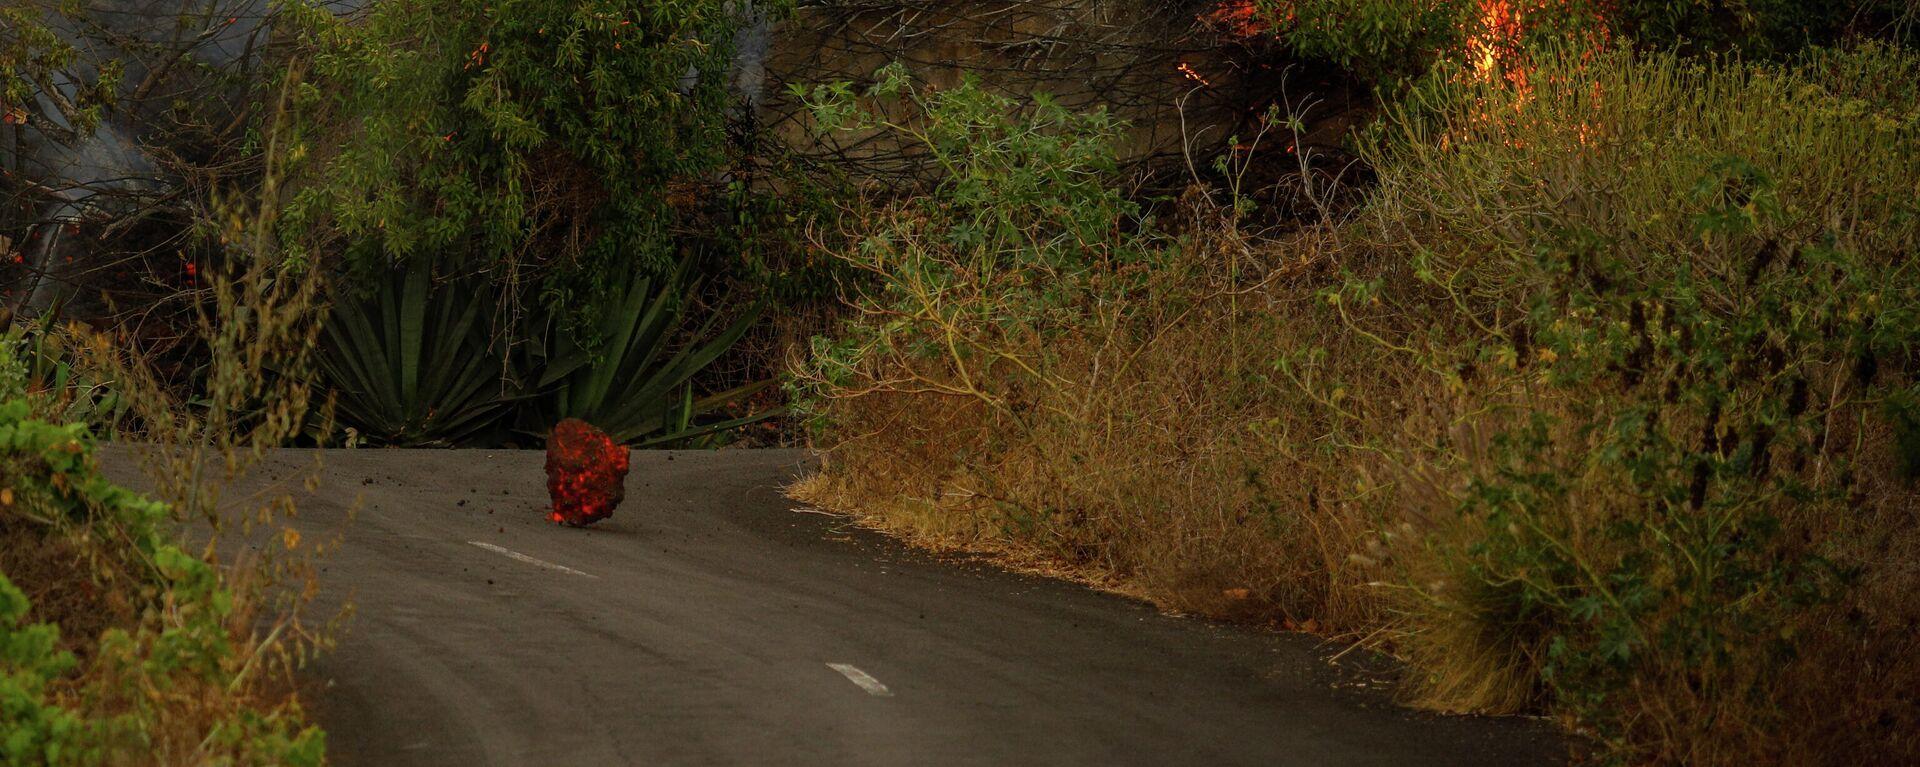 La lava del volcán cruza una carretera - Sputnik Mundo, 1920, 21.09.2021